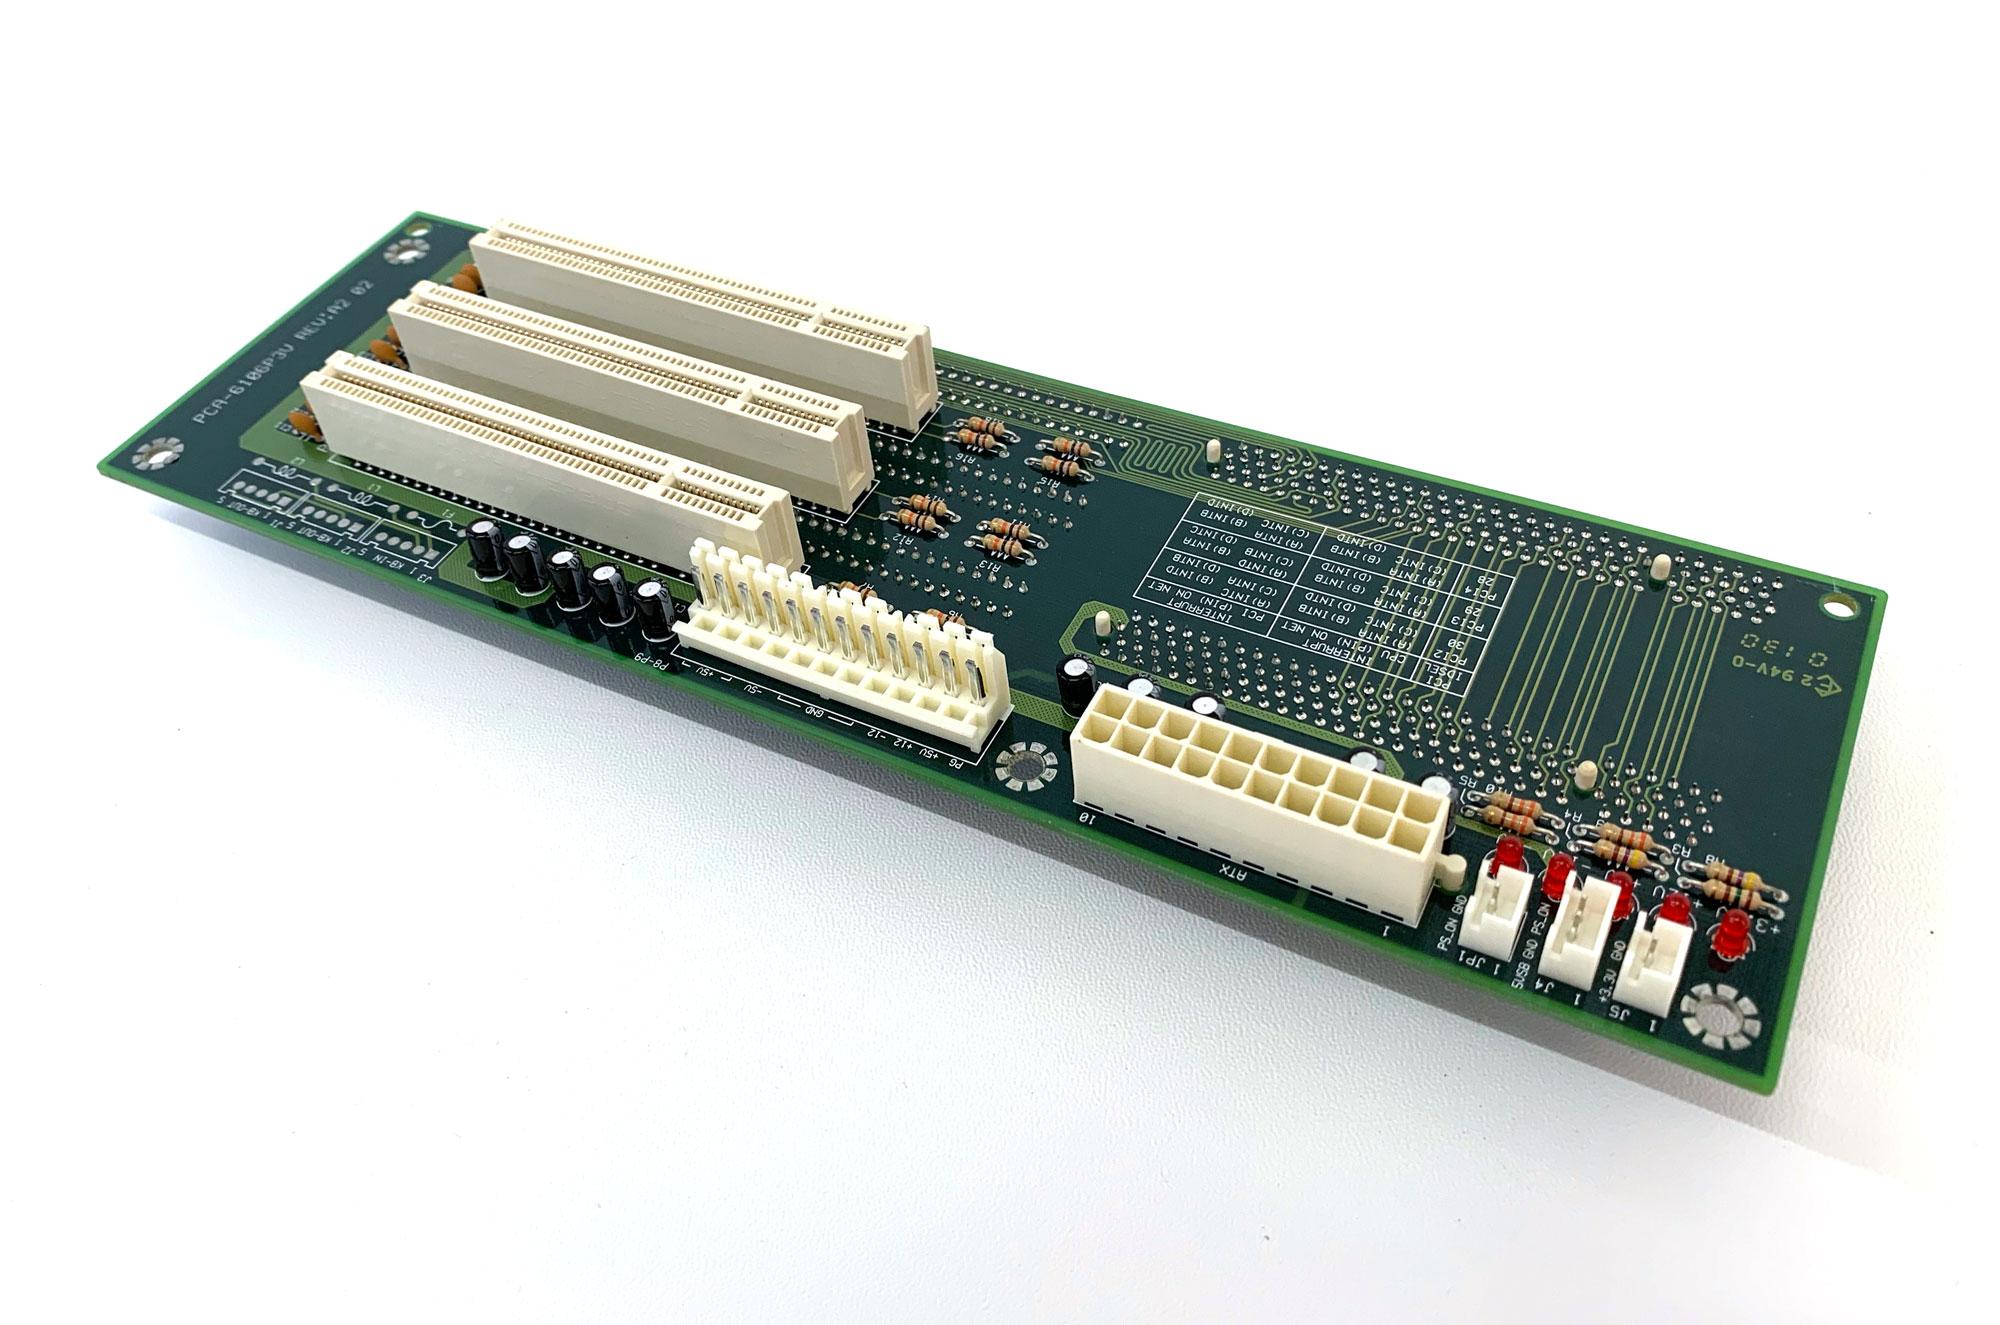 PCA-6106P3V - 6 Slot ISA / PCI Backplane für 2HE Gehäuse